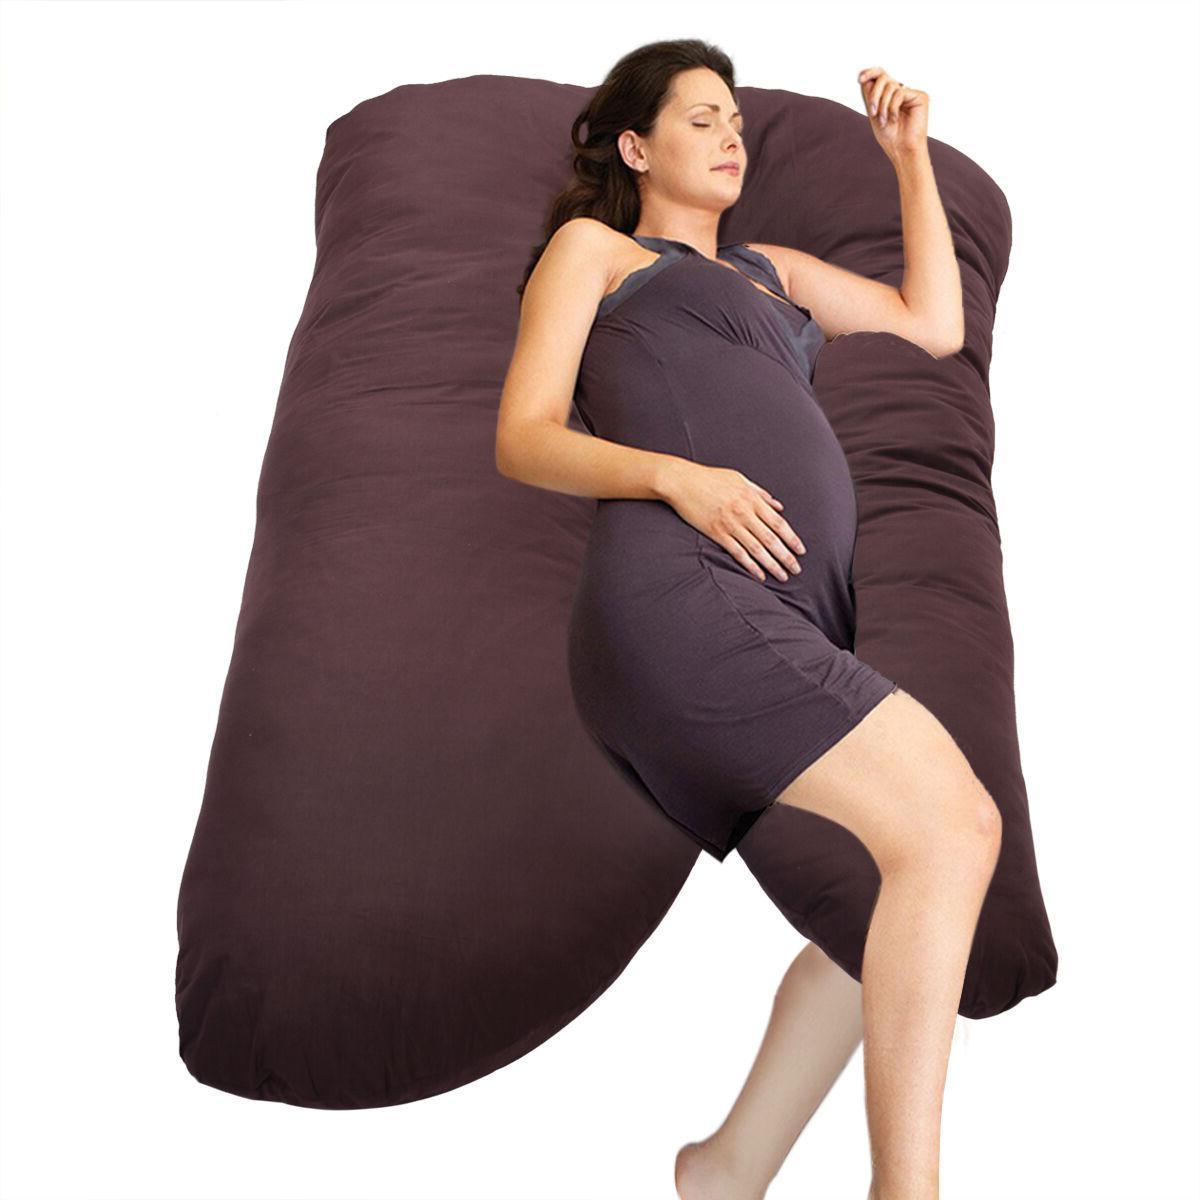 U Shape Total Body Pillow Body Pregnancy /Maternity